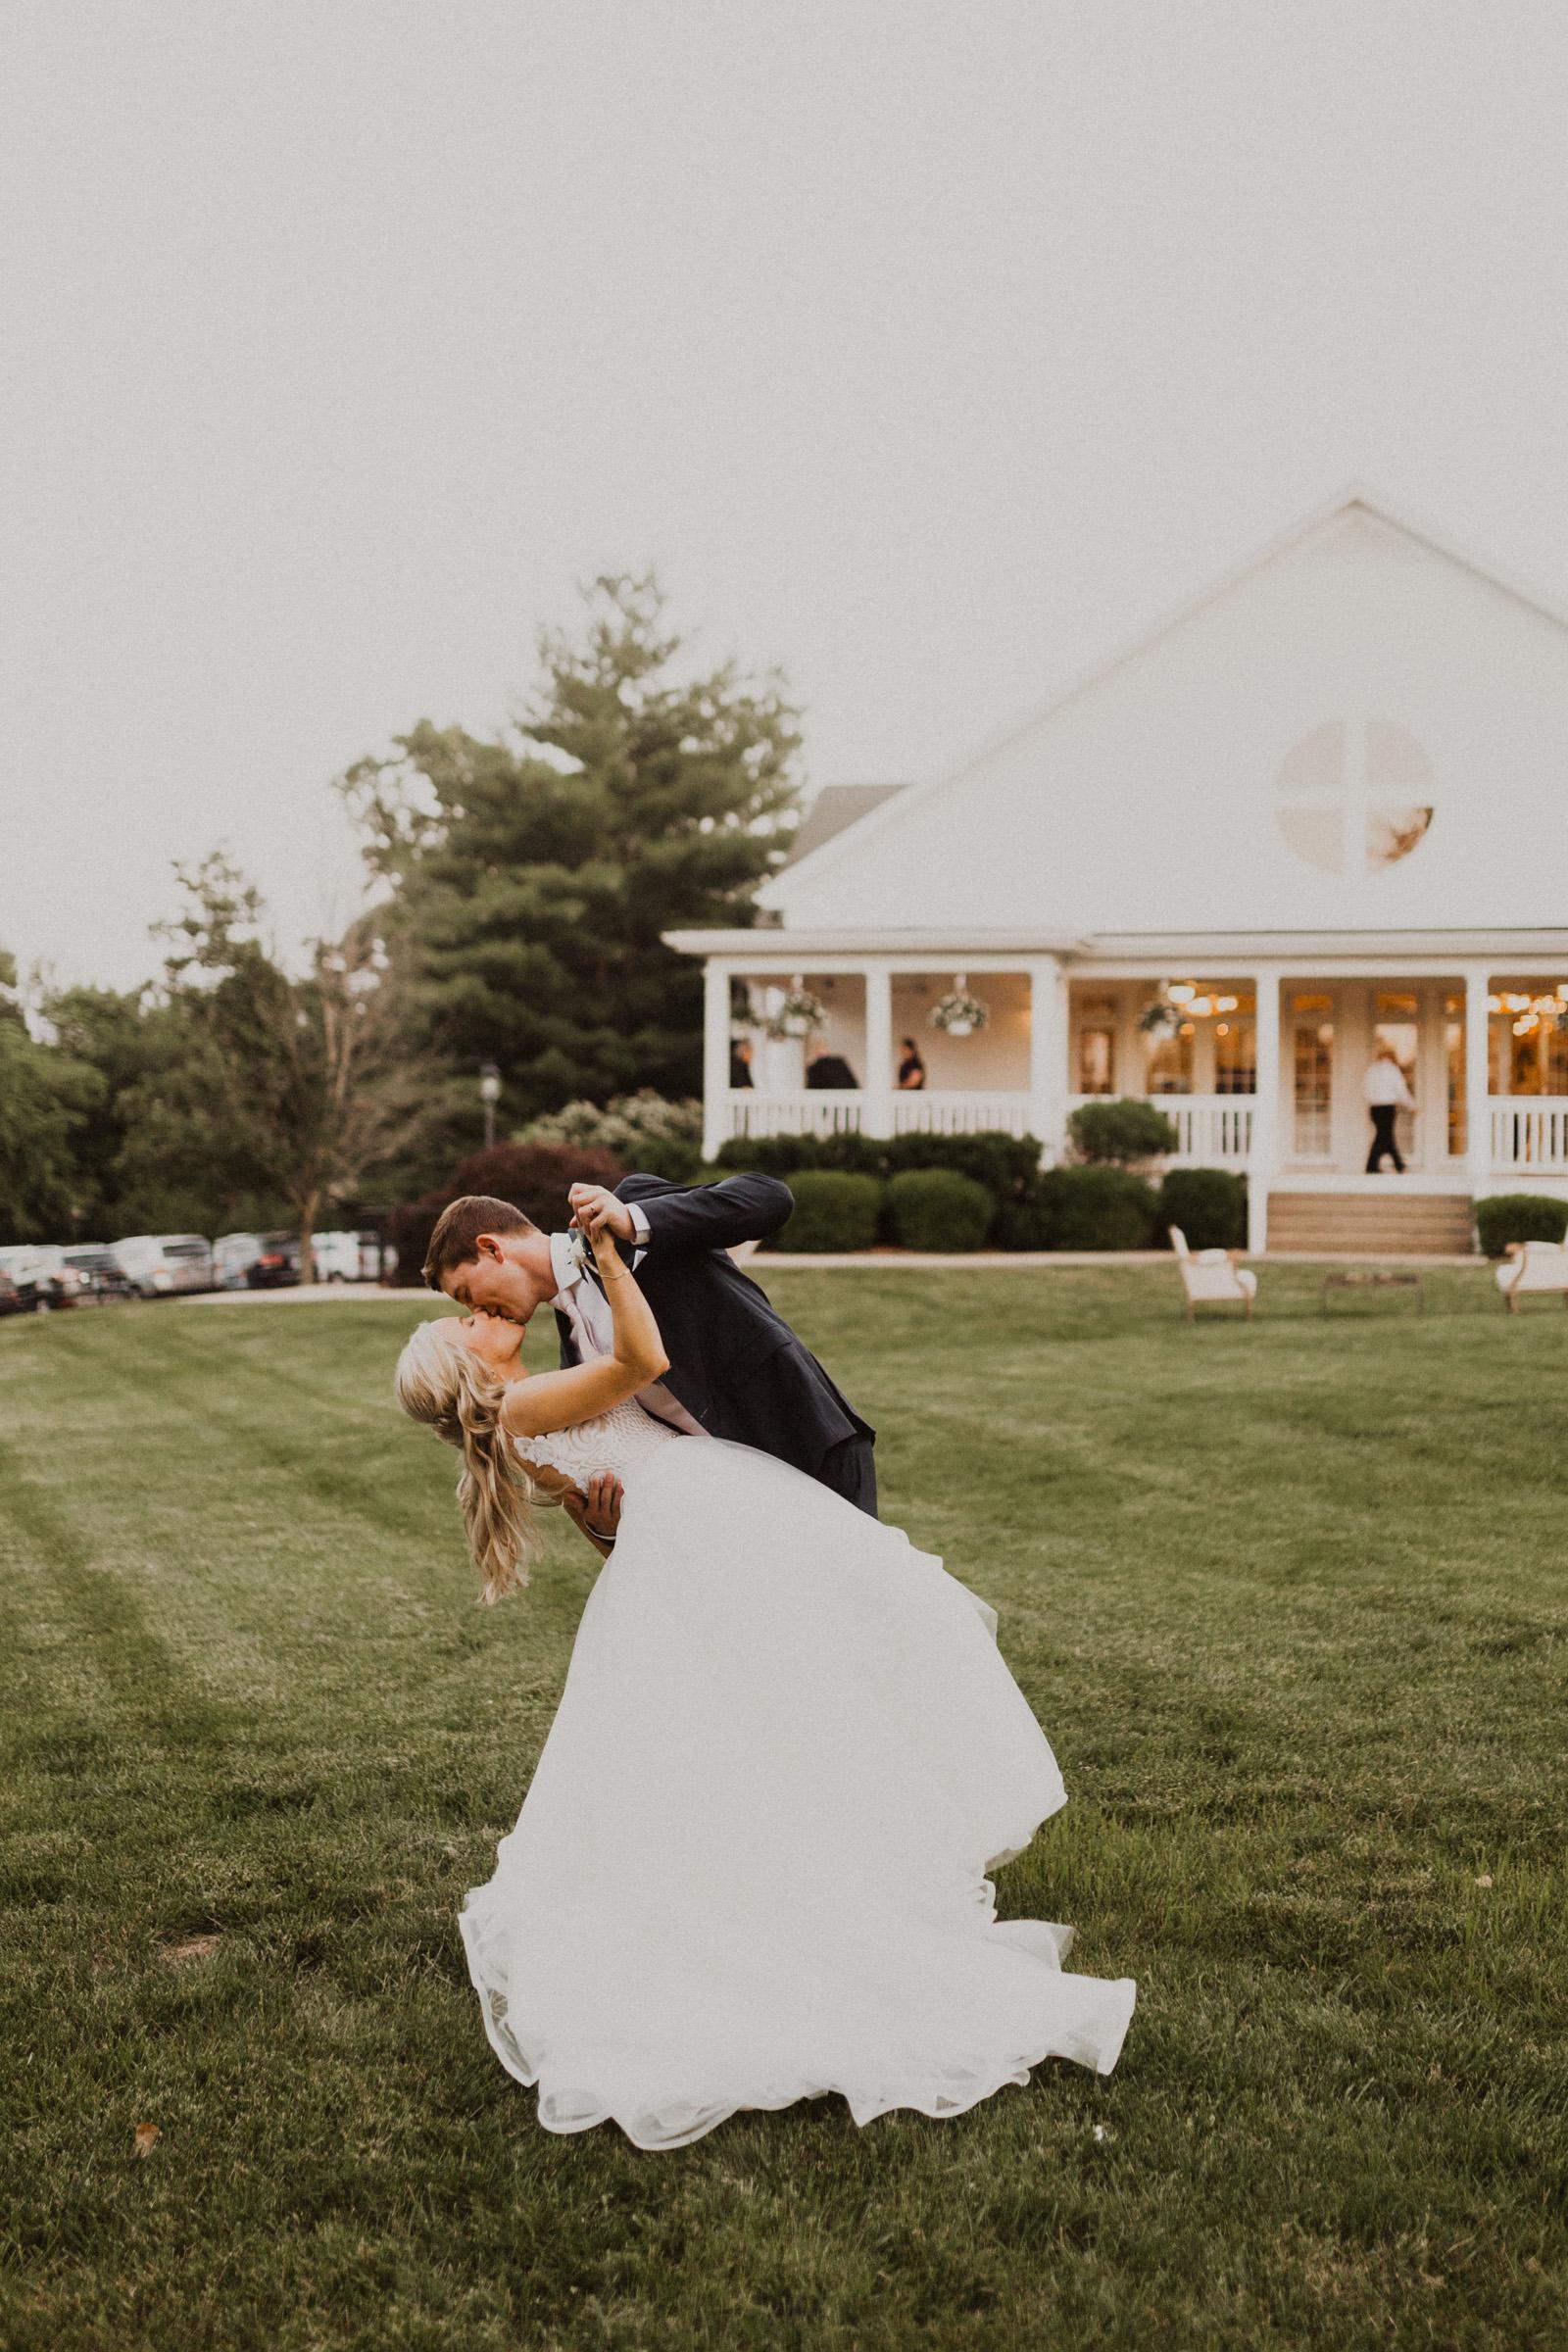 alyssa barletter photography hawthorne house summer outdoor wedding southern charm inspiration-58.jpg